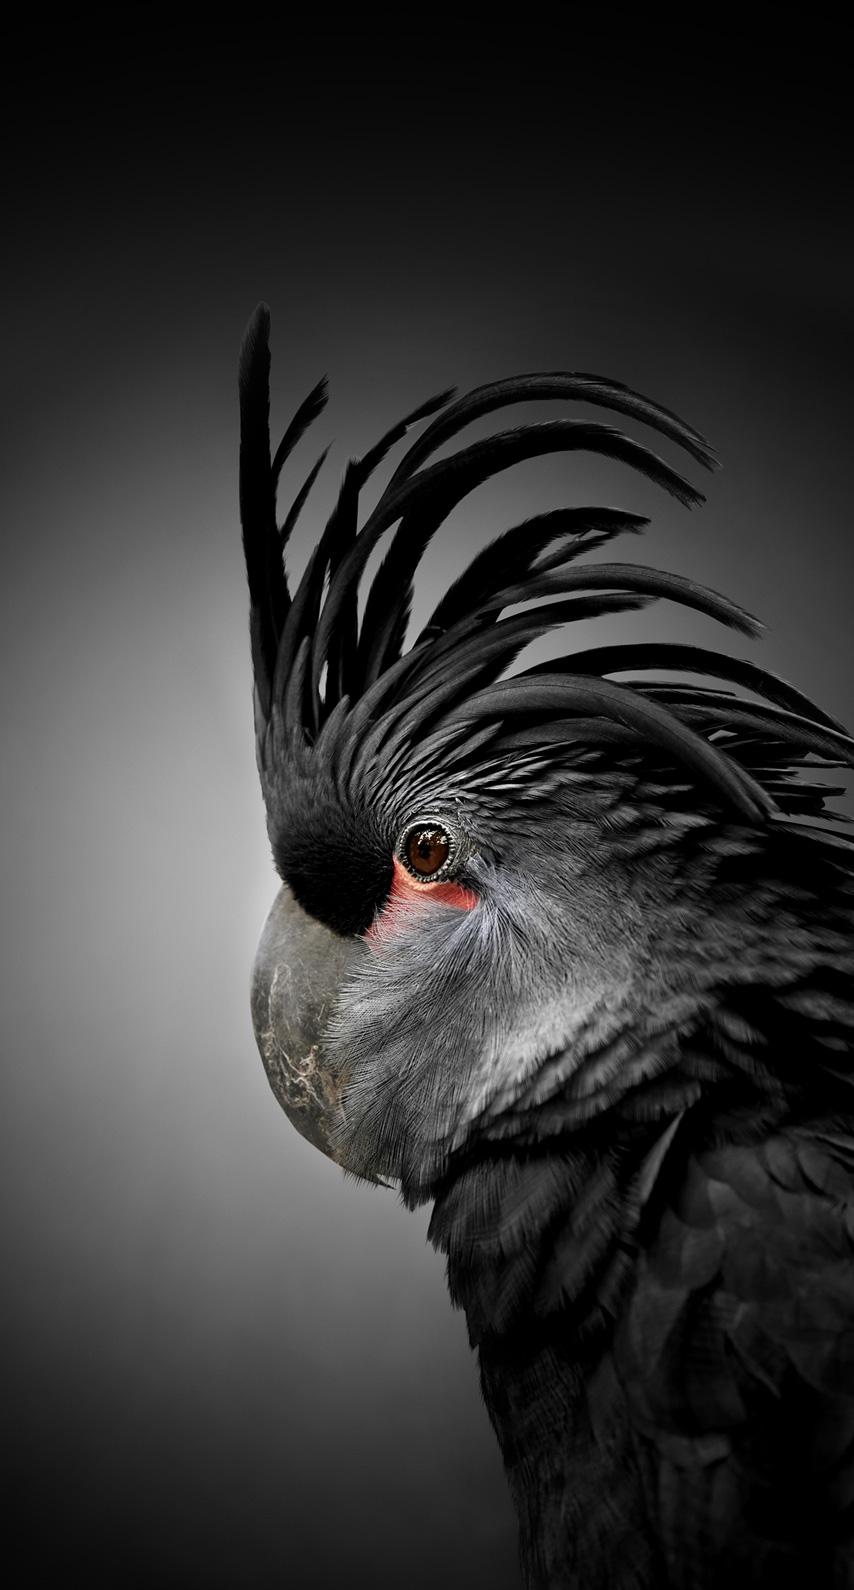 dark, bird